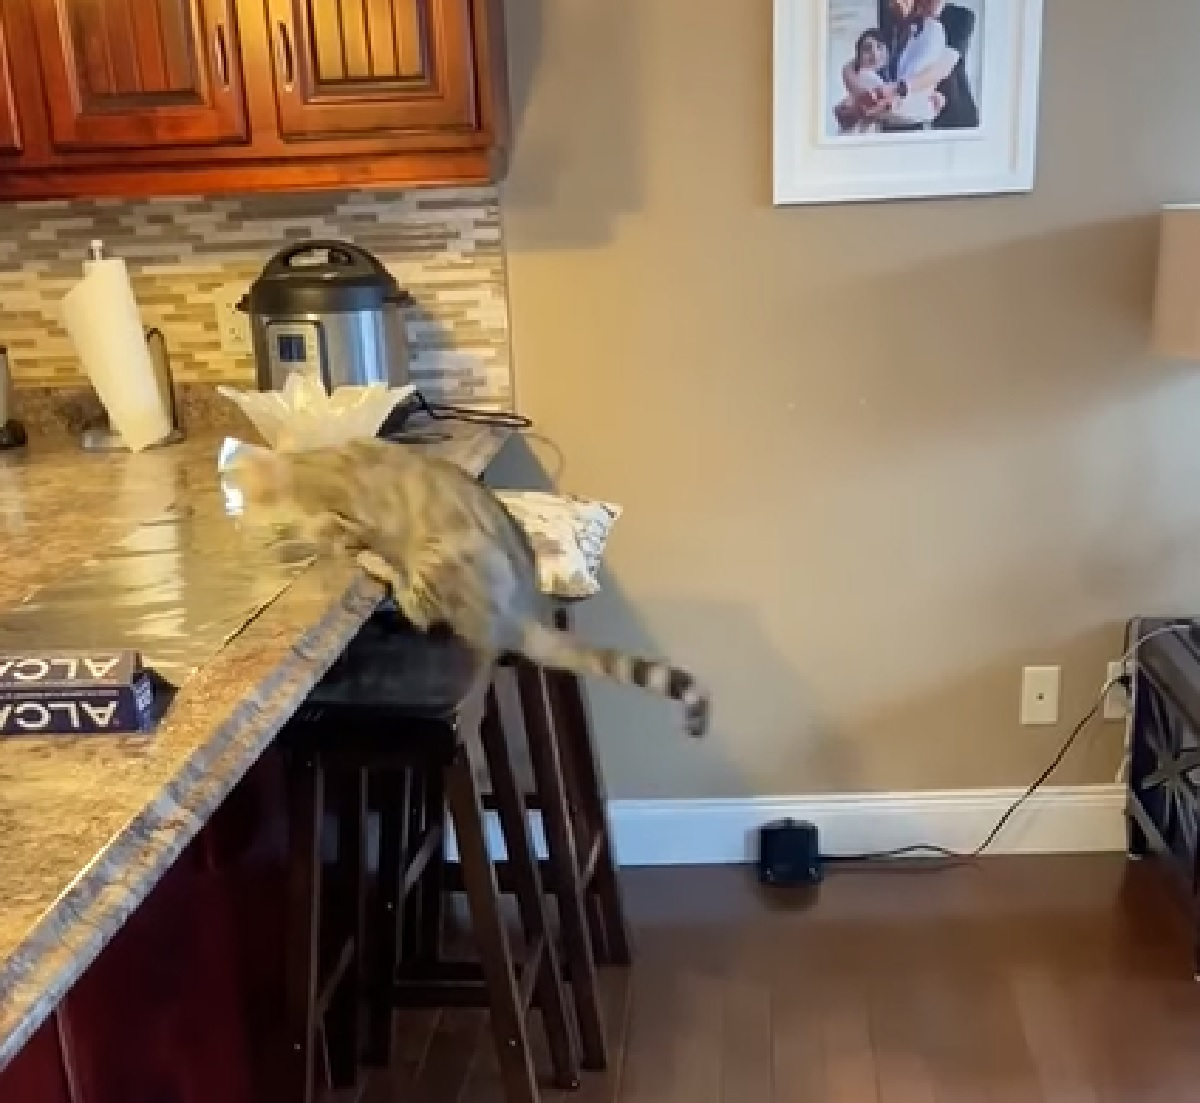 gattino salto sul tavolino